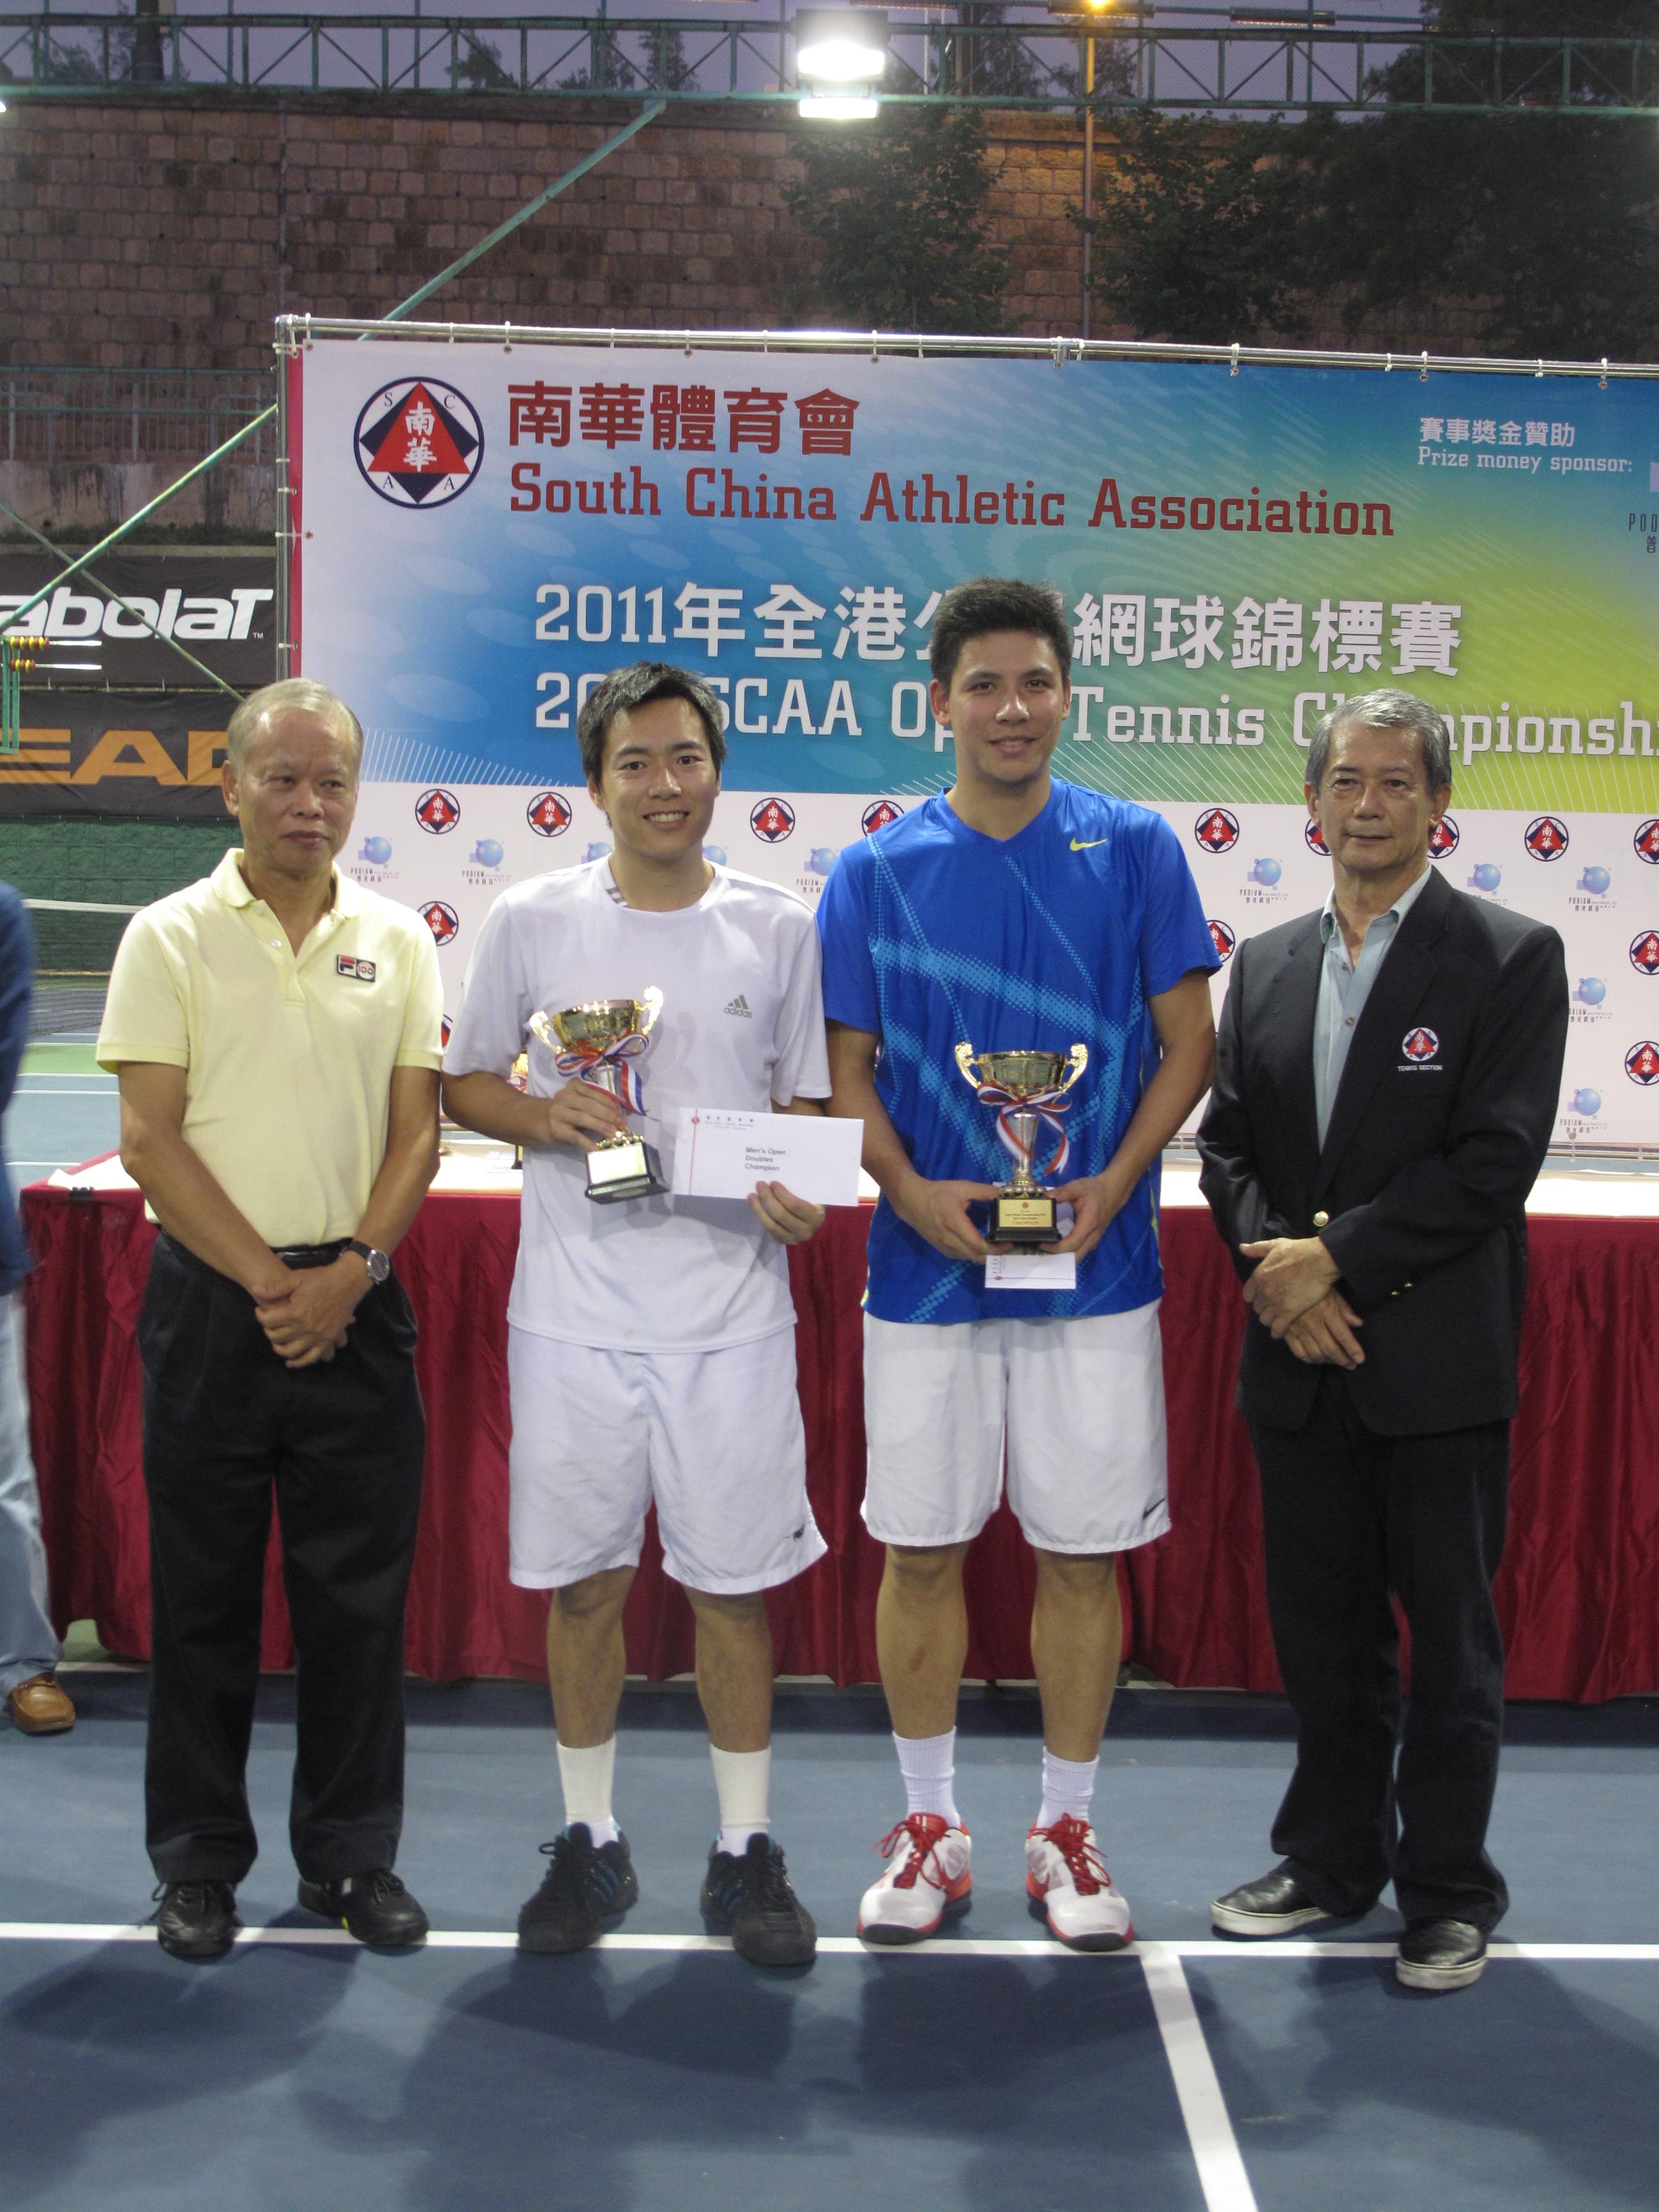 2011 SCAA Open Tennis Championships